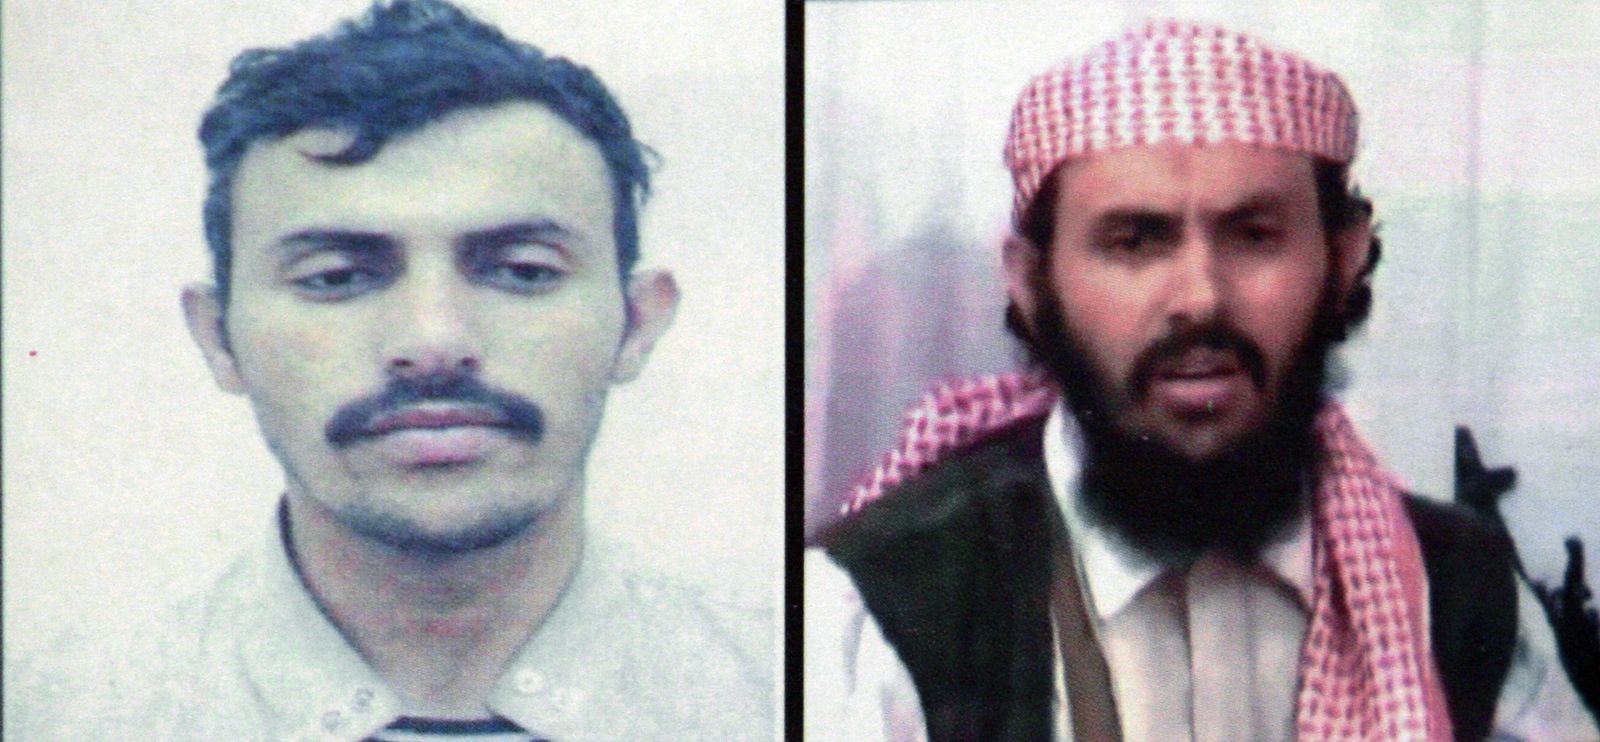 Jemen/ Qassem al-Rimi/ Qasim al Raimi